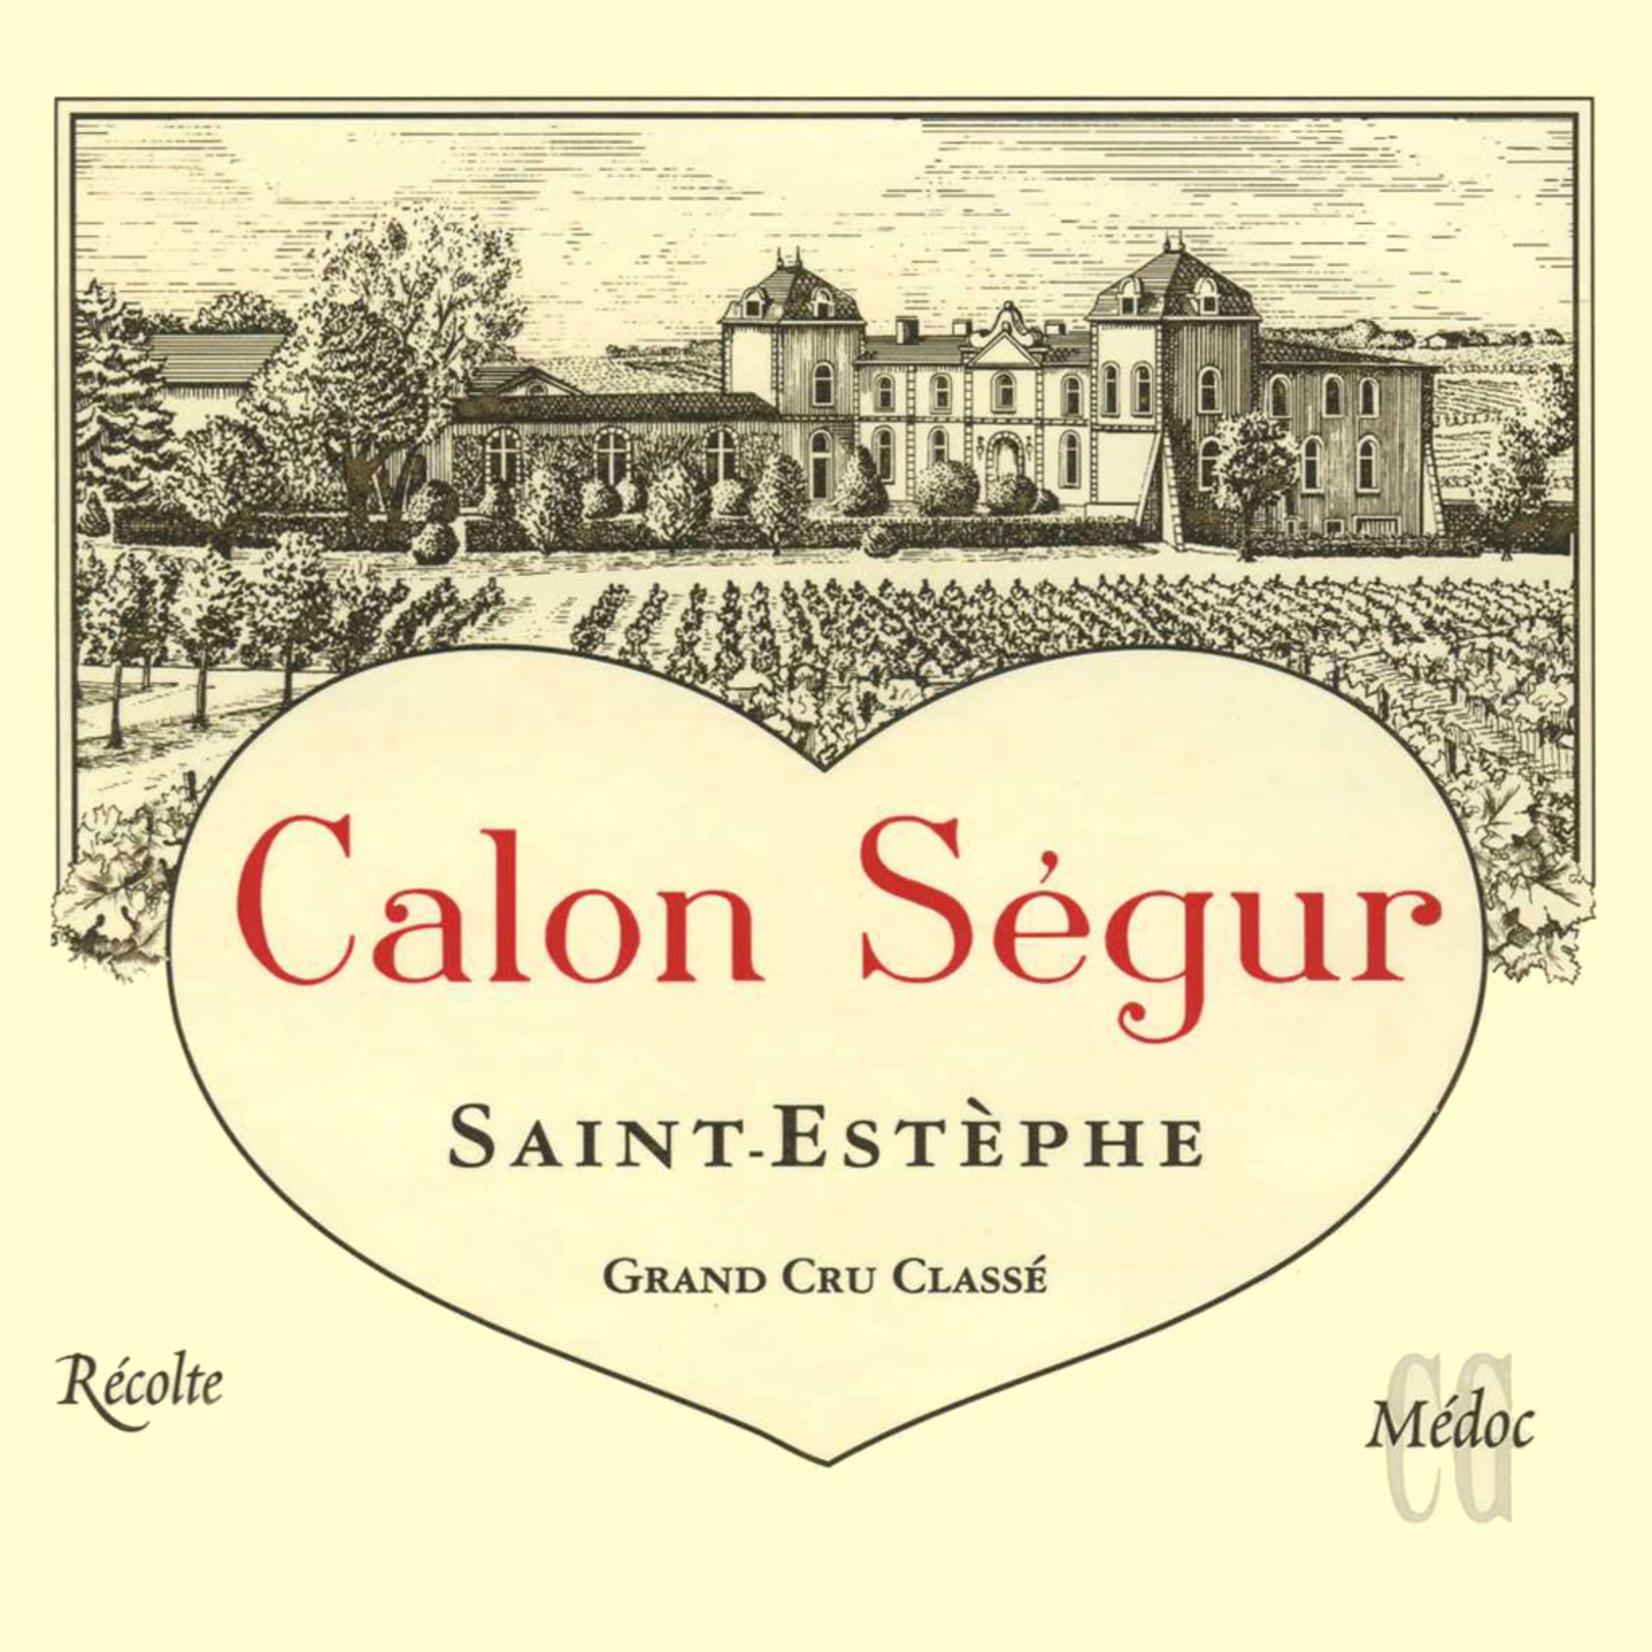 Chateau Calon Segur 2010